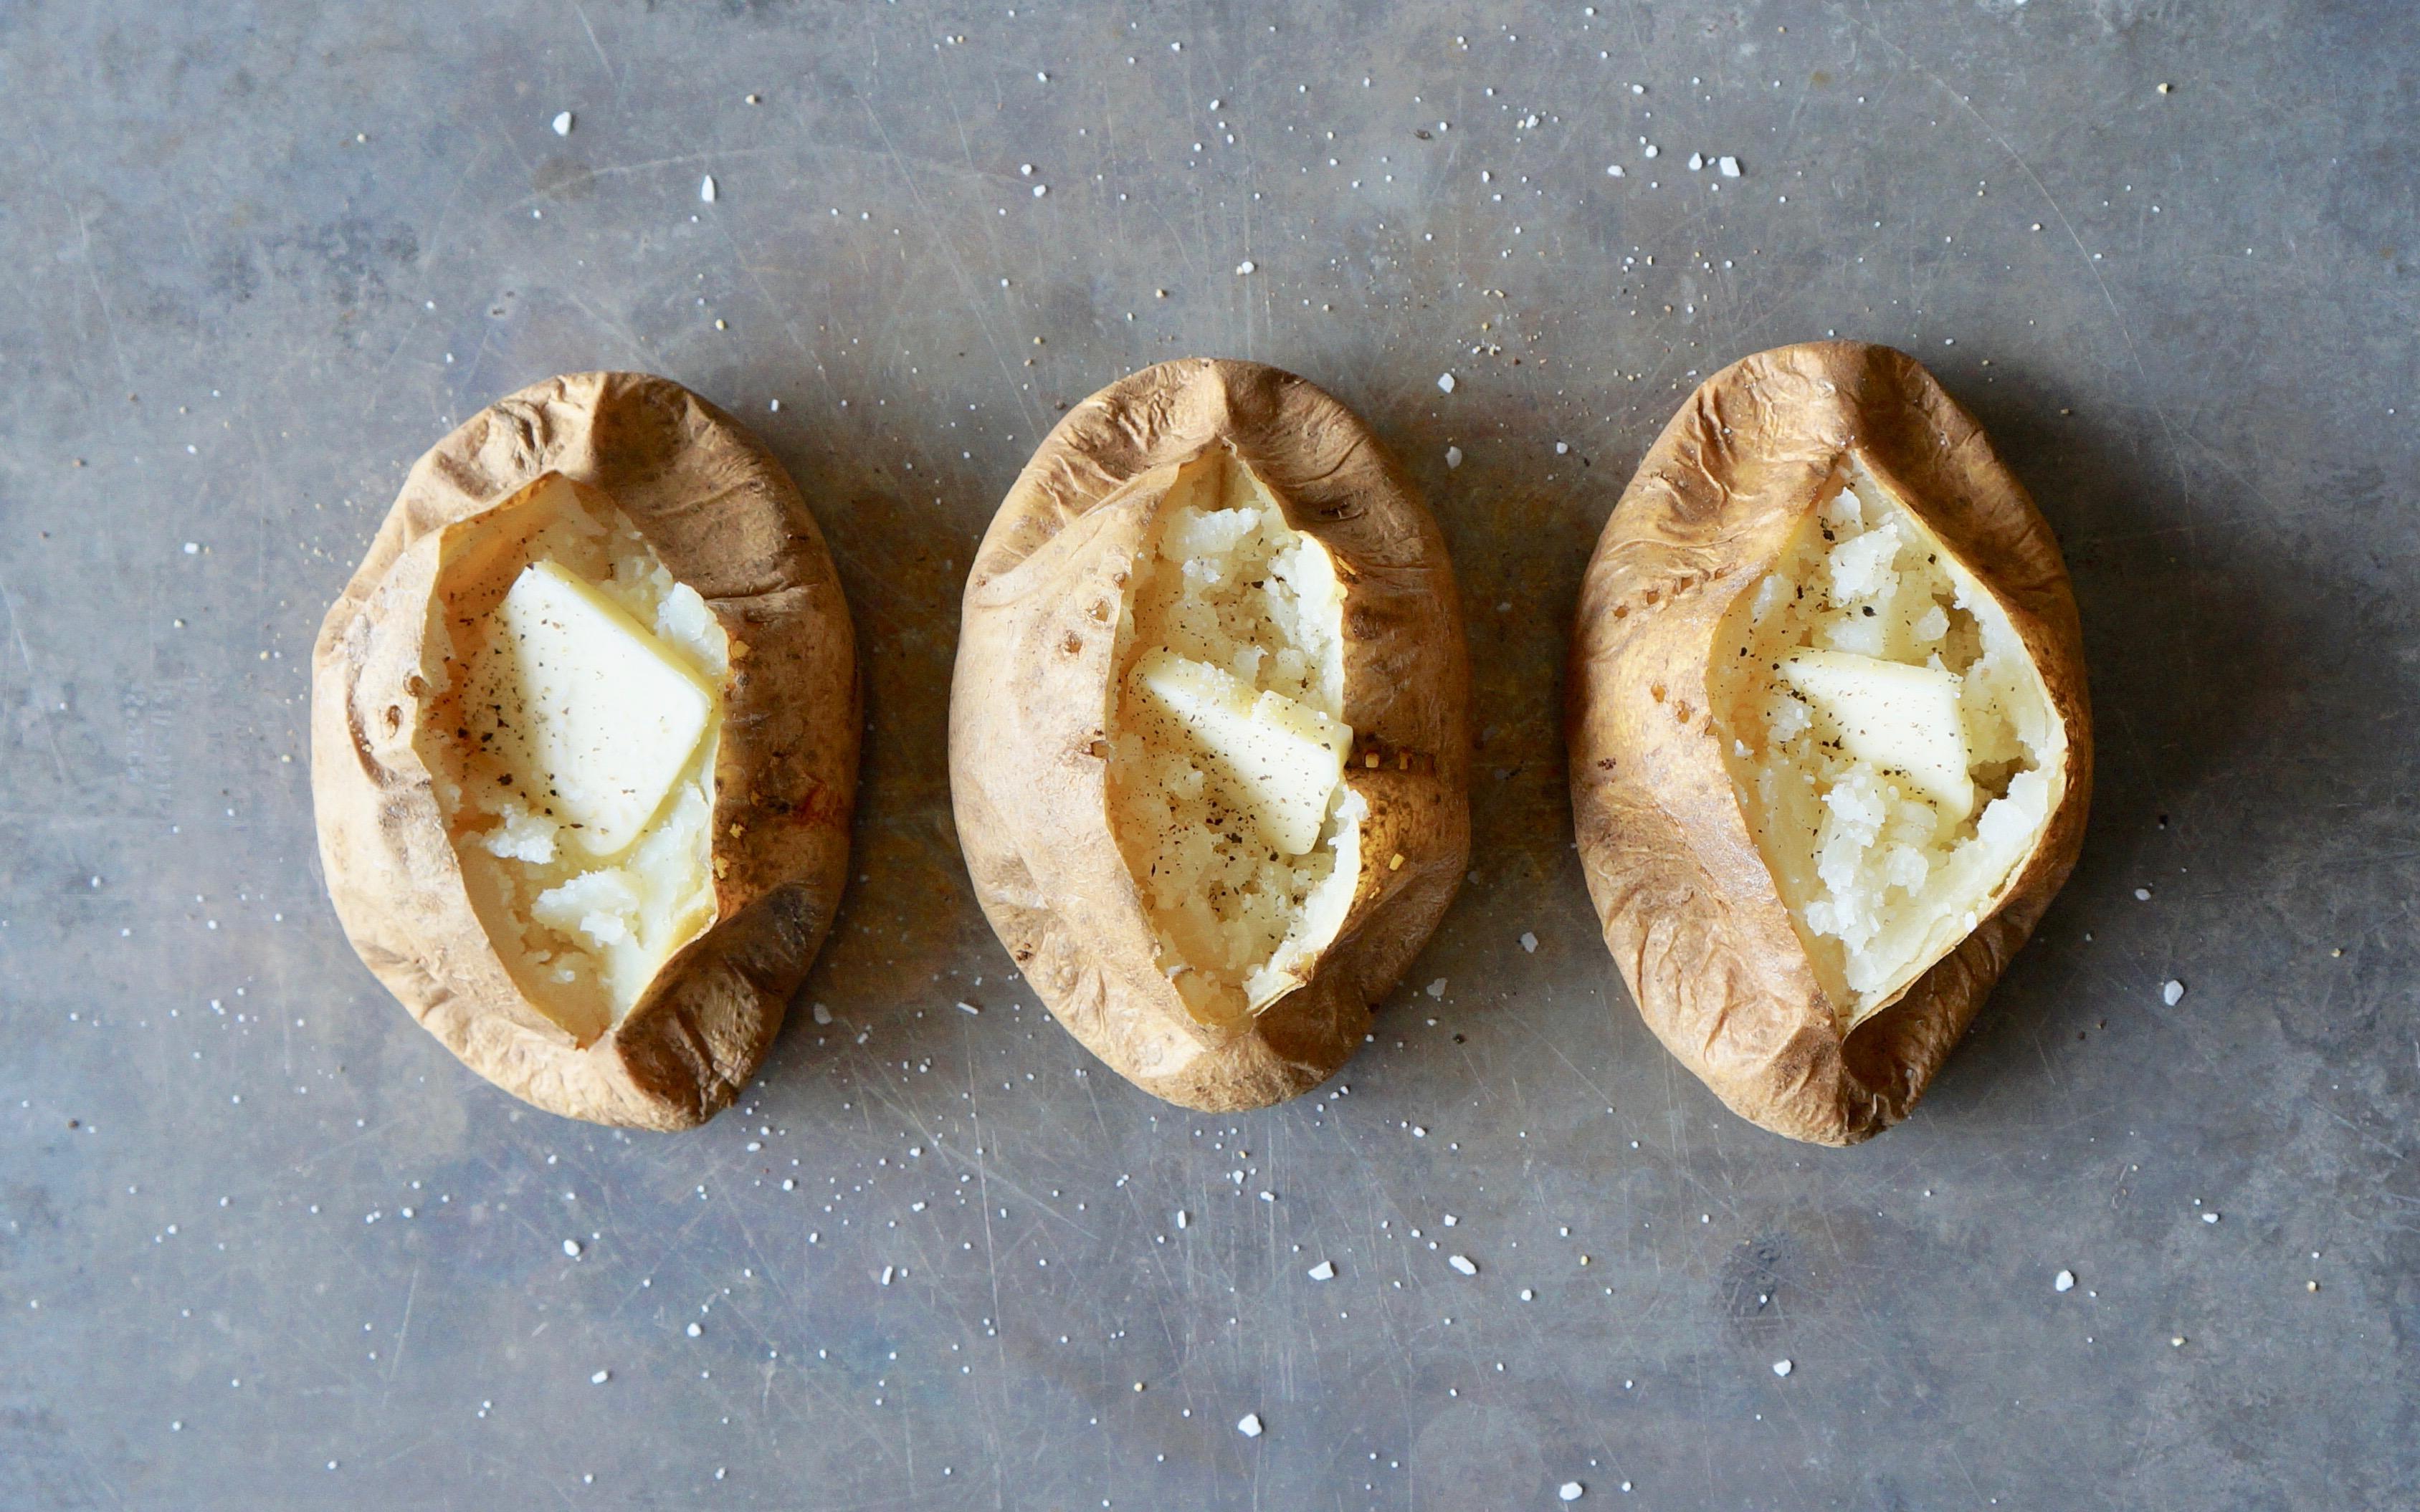 How-Do-You-Bake-Potatoes-In-The-Oven-Rebecca-Gordon-Publisher-Buttermilk-Lipstick-Culinary-Entertaining-Technique-RebeccaGordon-Pastry-Chef-Birmingham-Alabama